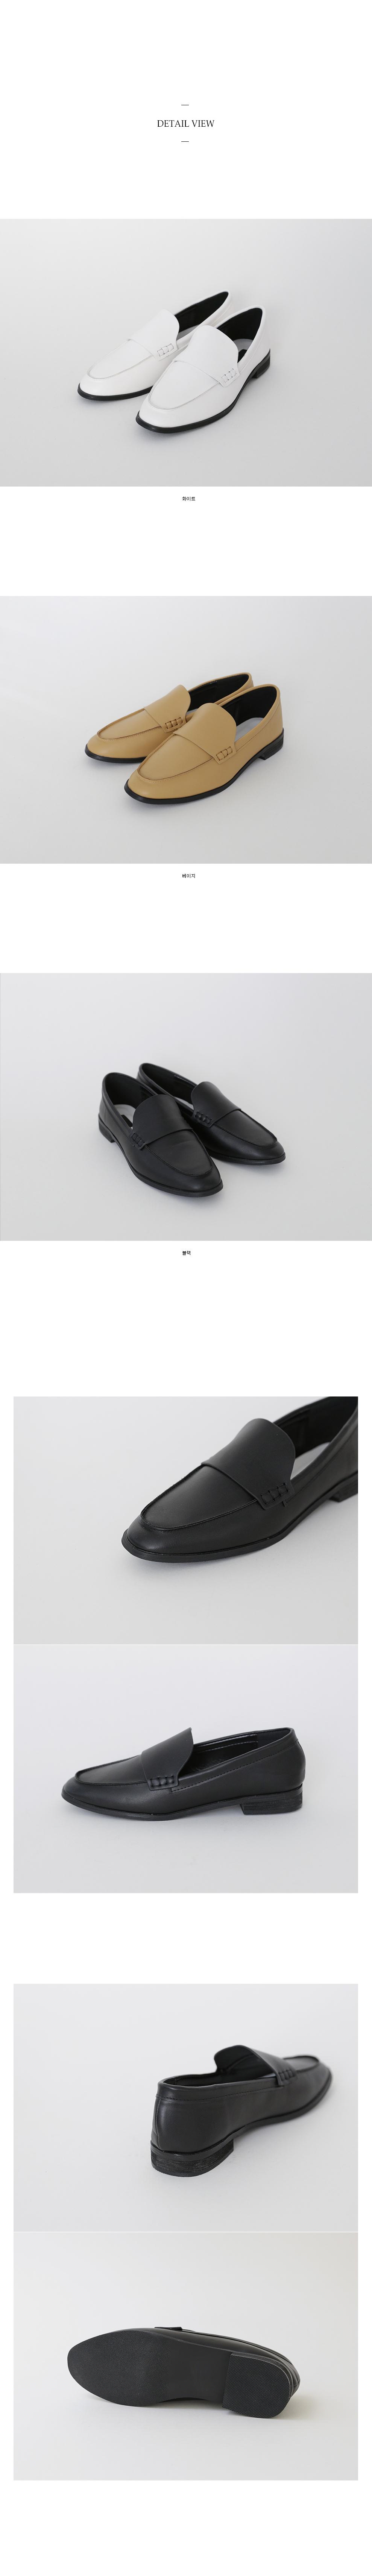 basic clean loafer